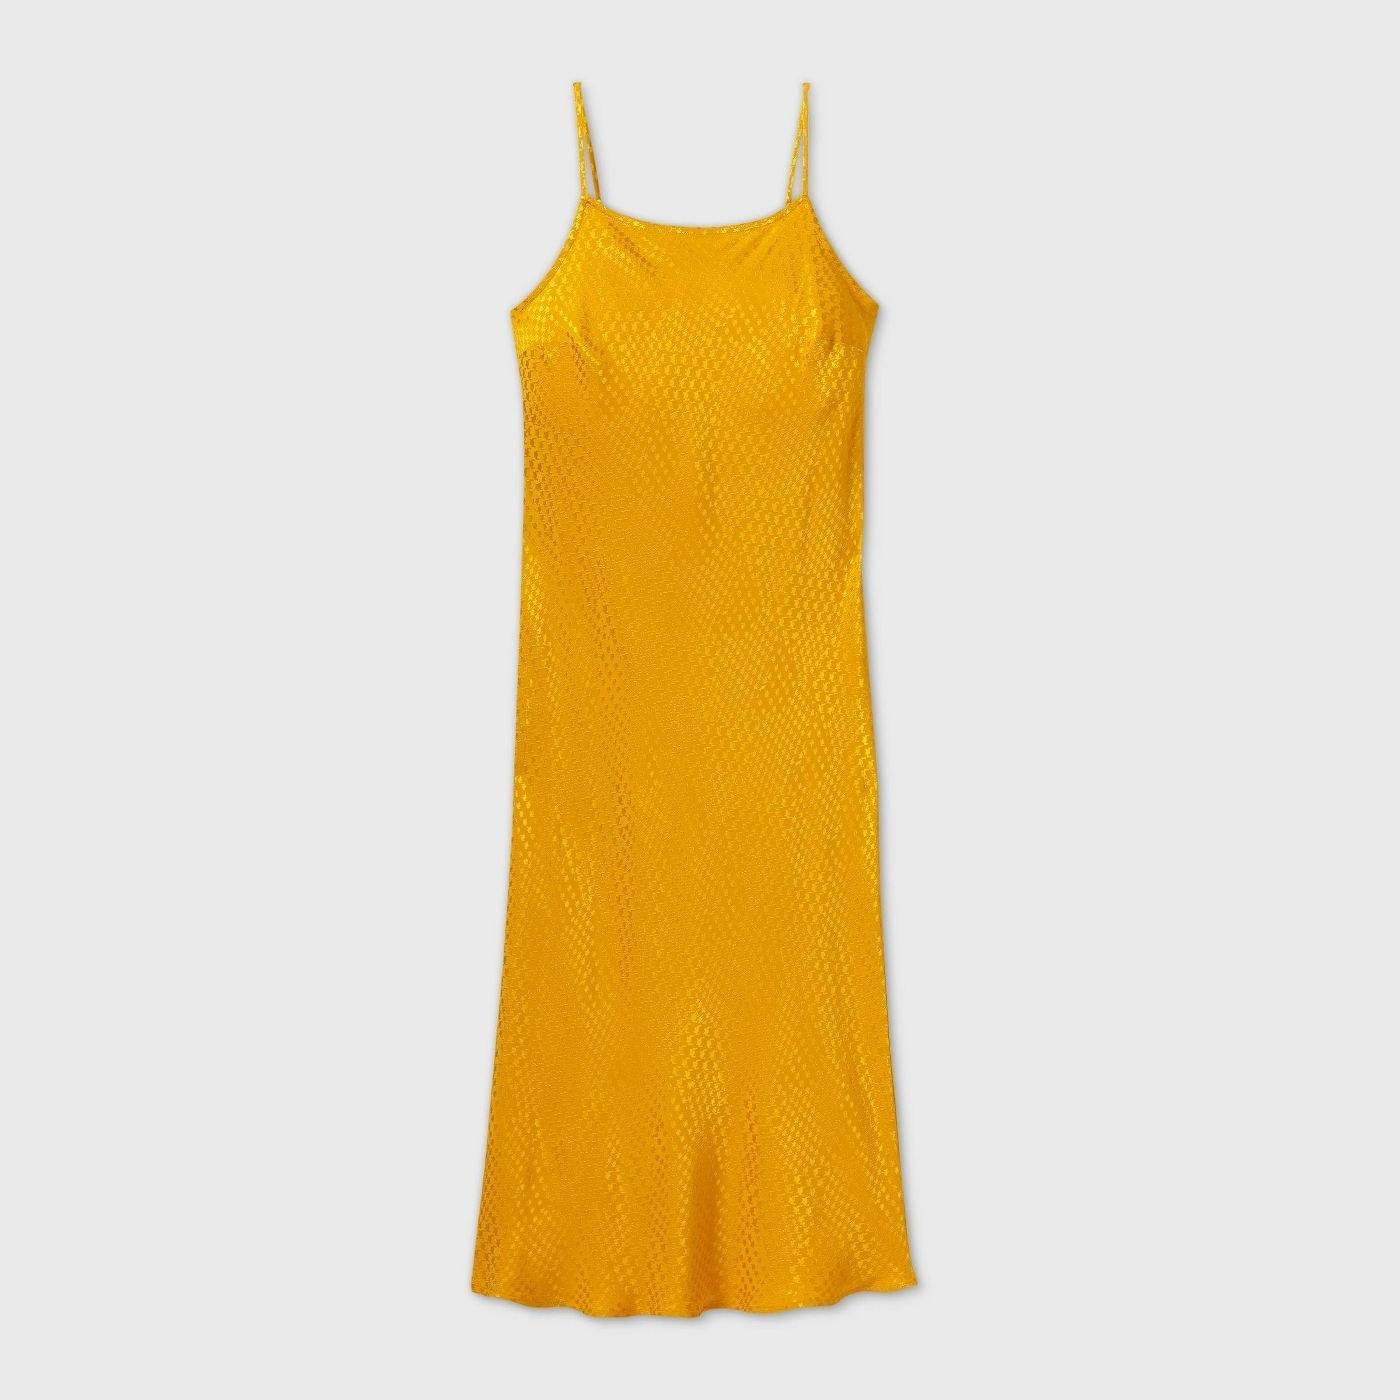 A yellow slip dress